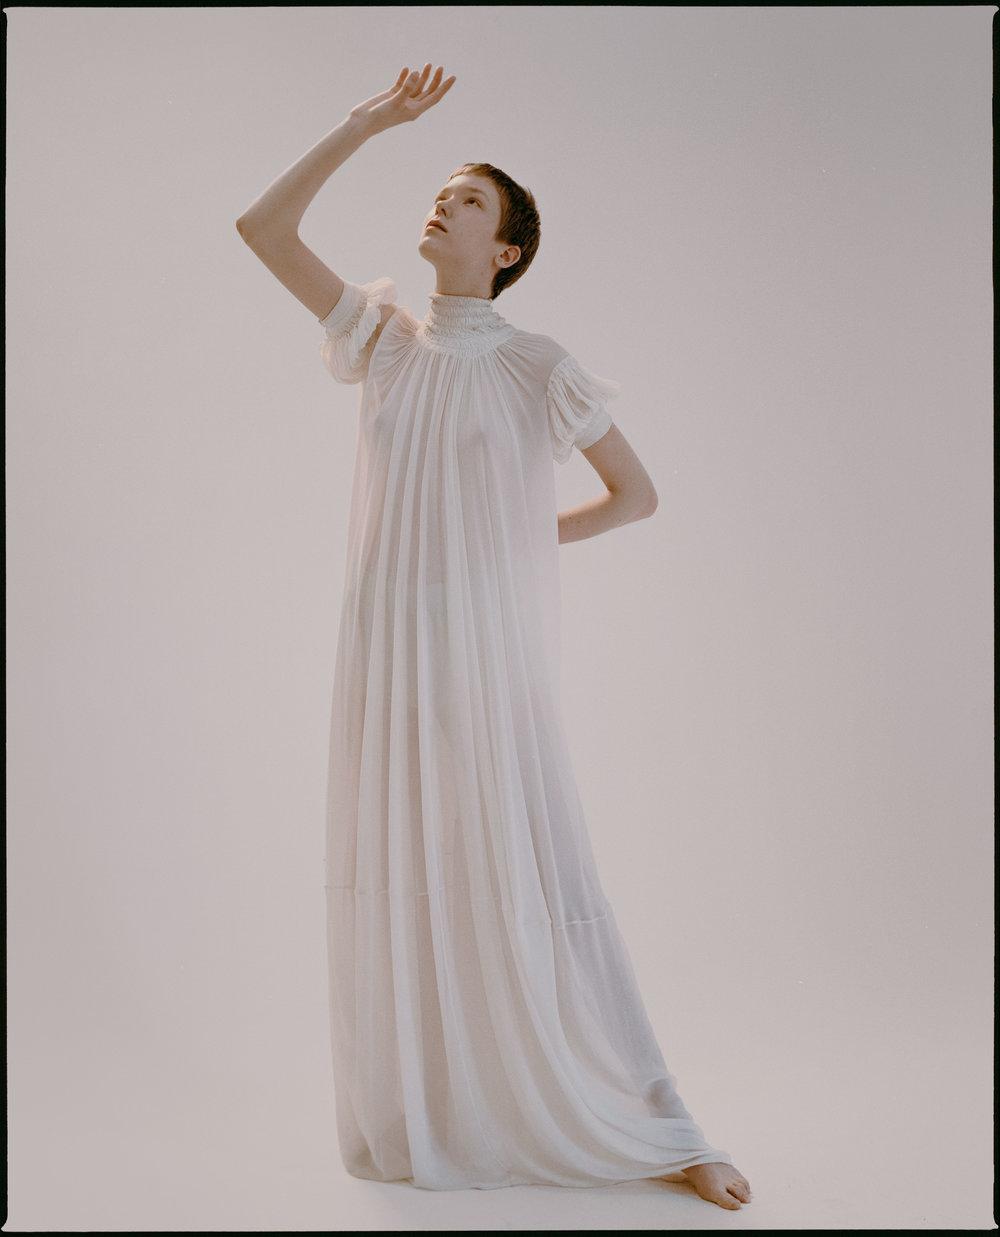 JIL SANDER dress.